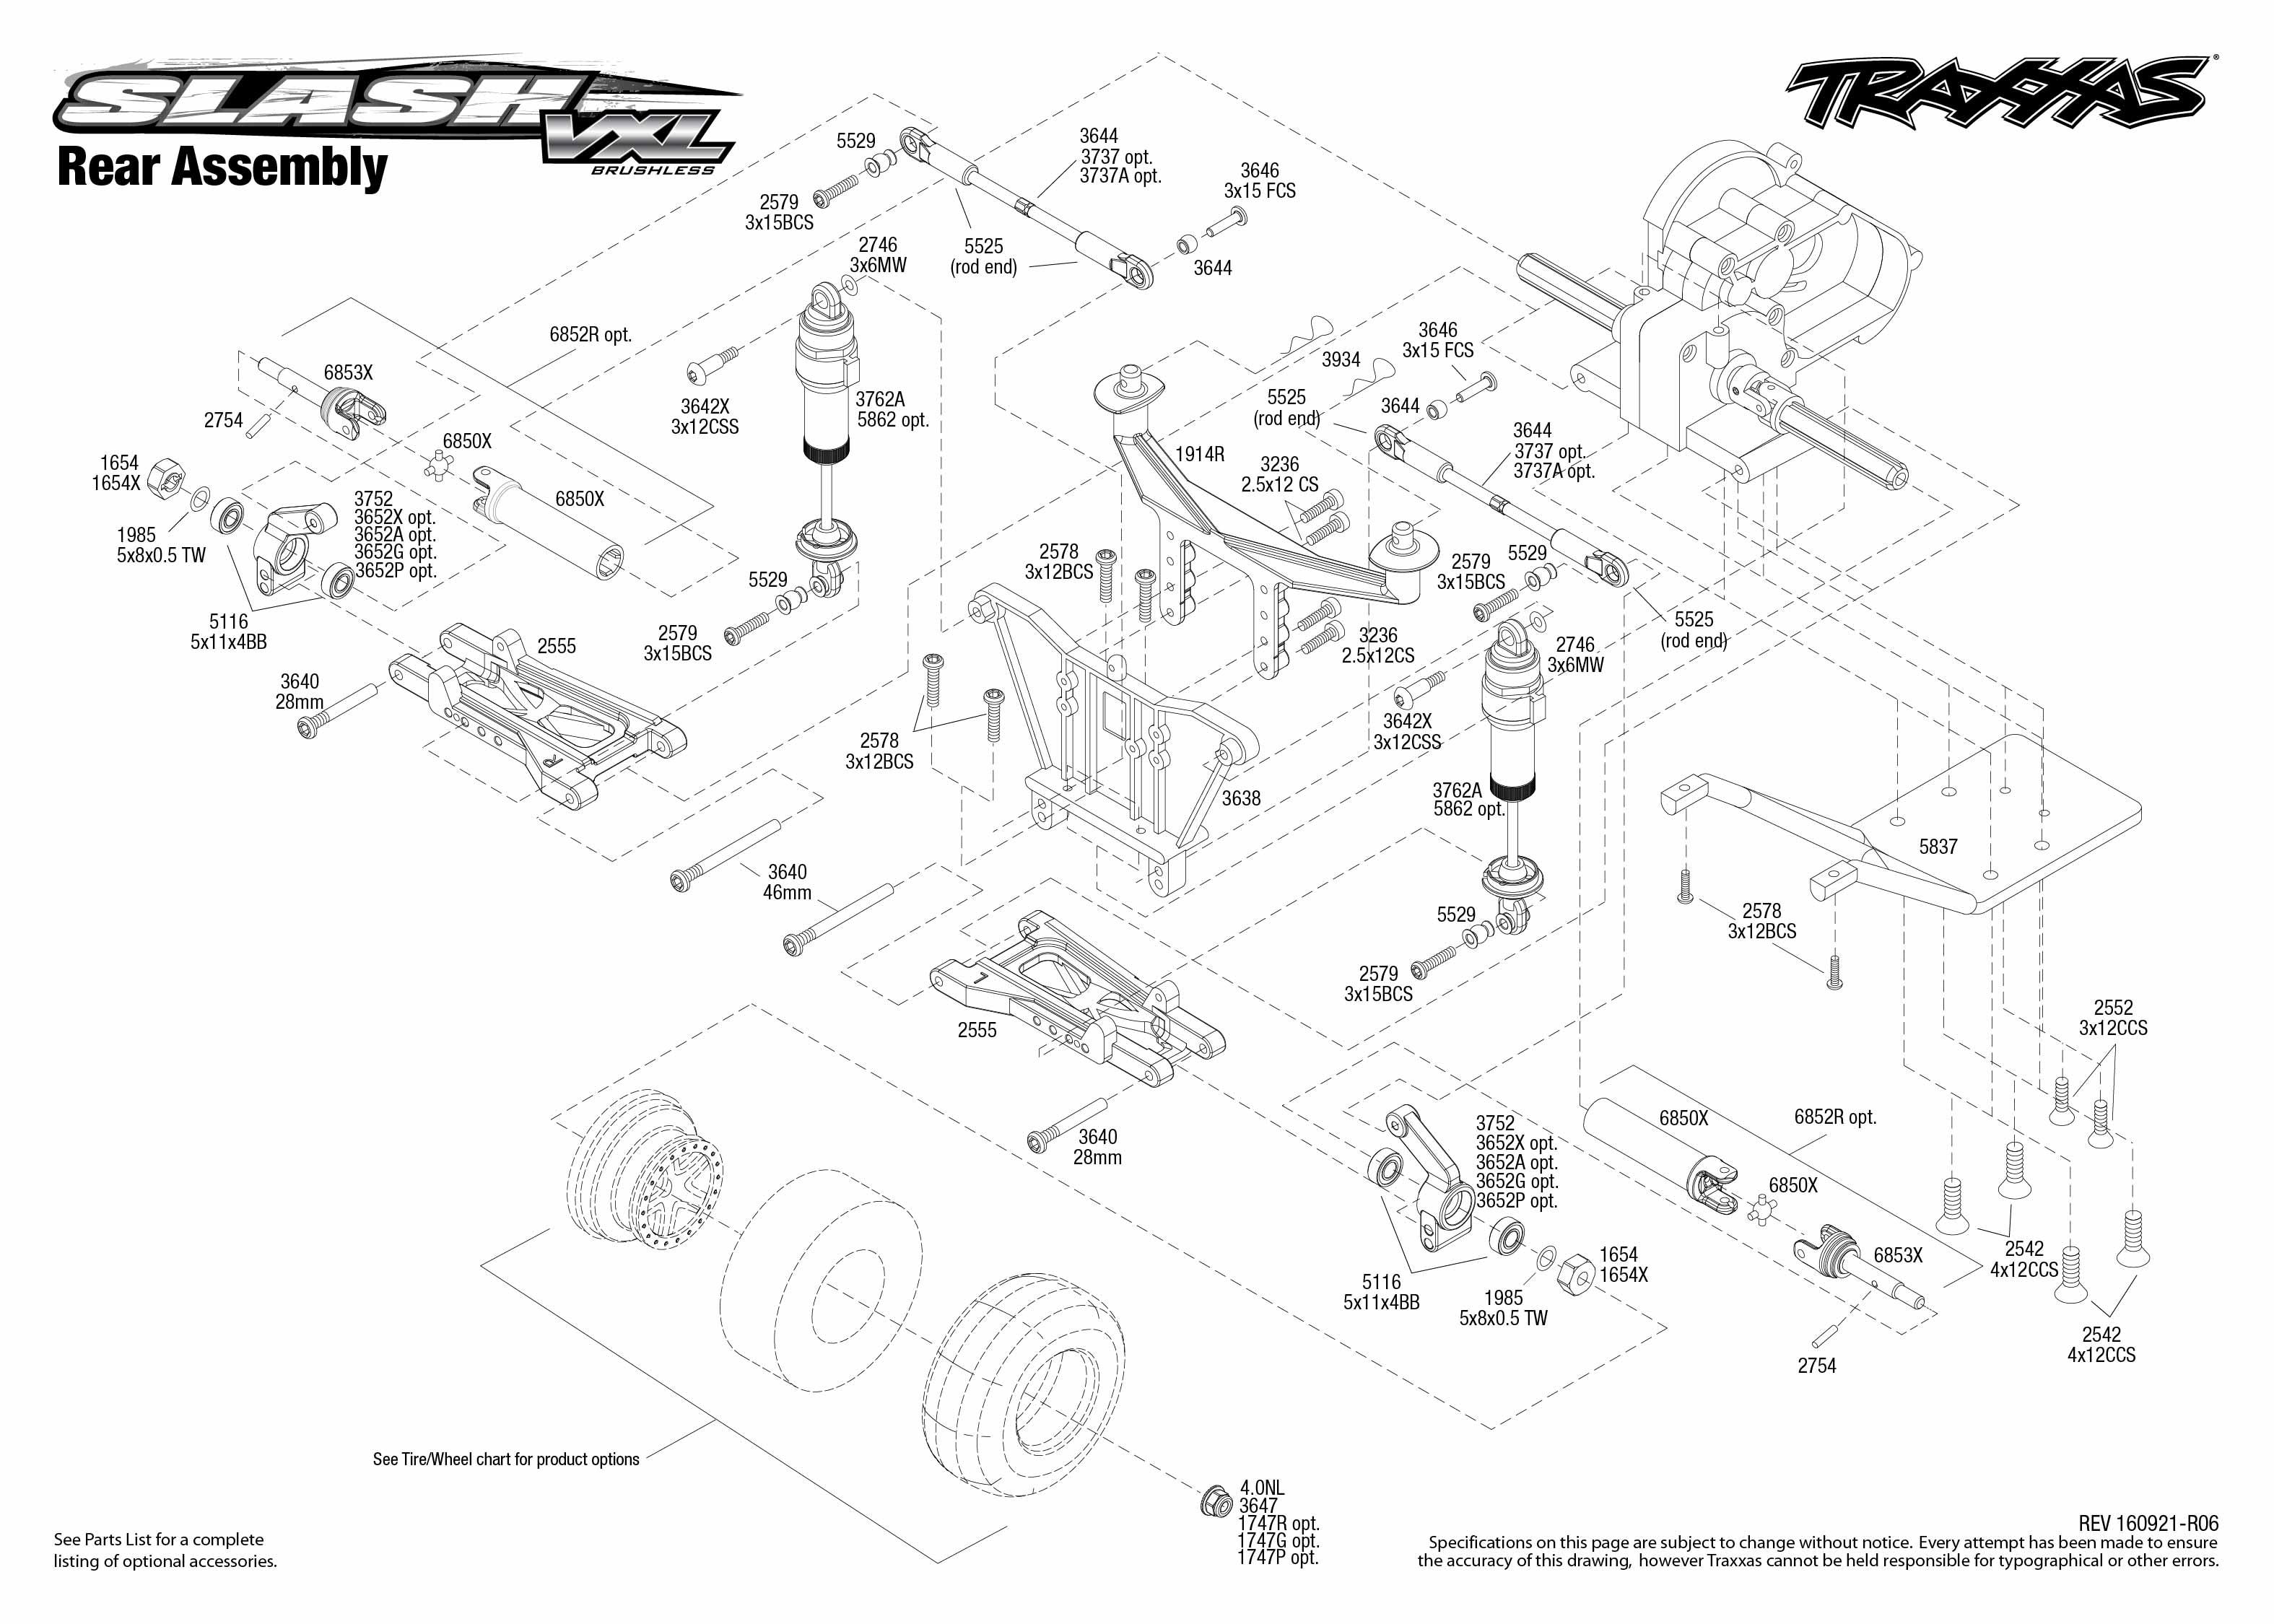 traxxas slash user manual how to and user guide instructions u2022 rh taxibermuda co traxxas slash 2wd vxl parts Traxxas Slash 2WD Review